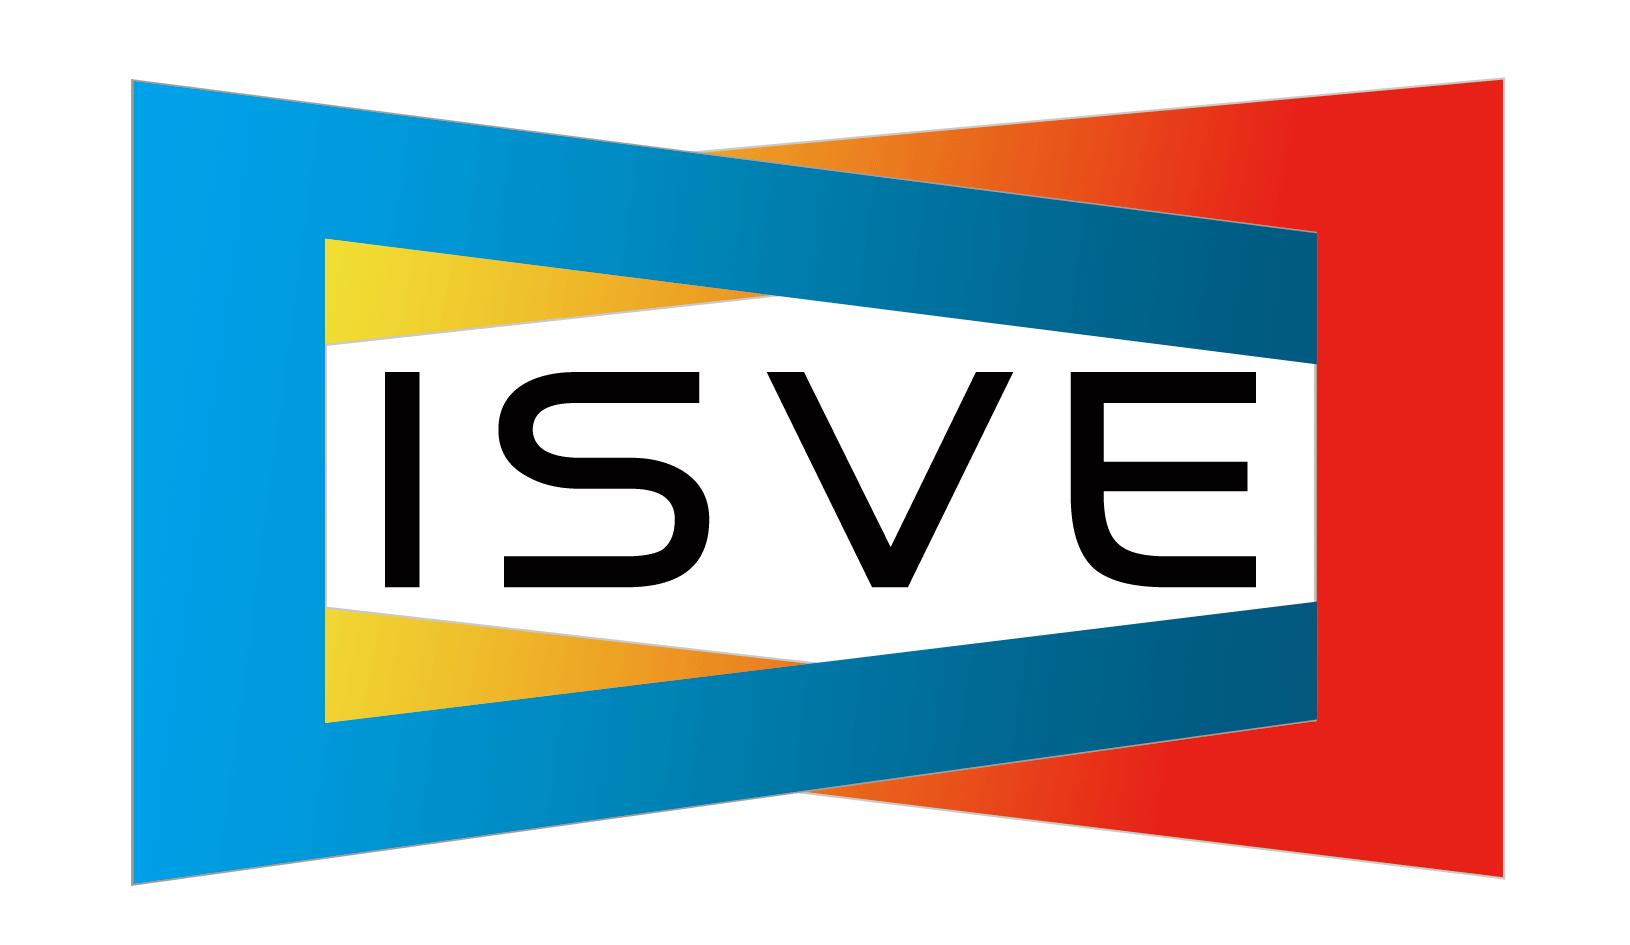 【ISVE情报】听说ISVE的展商很「多面」,快来Pick一下